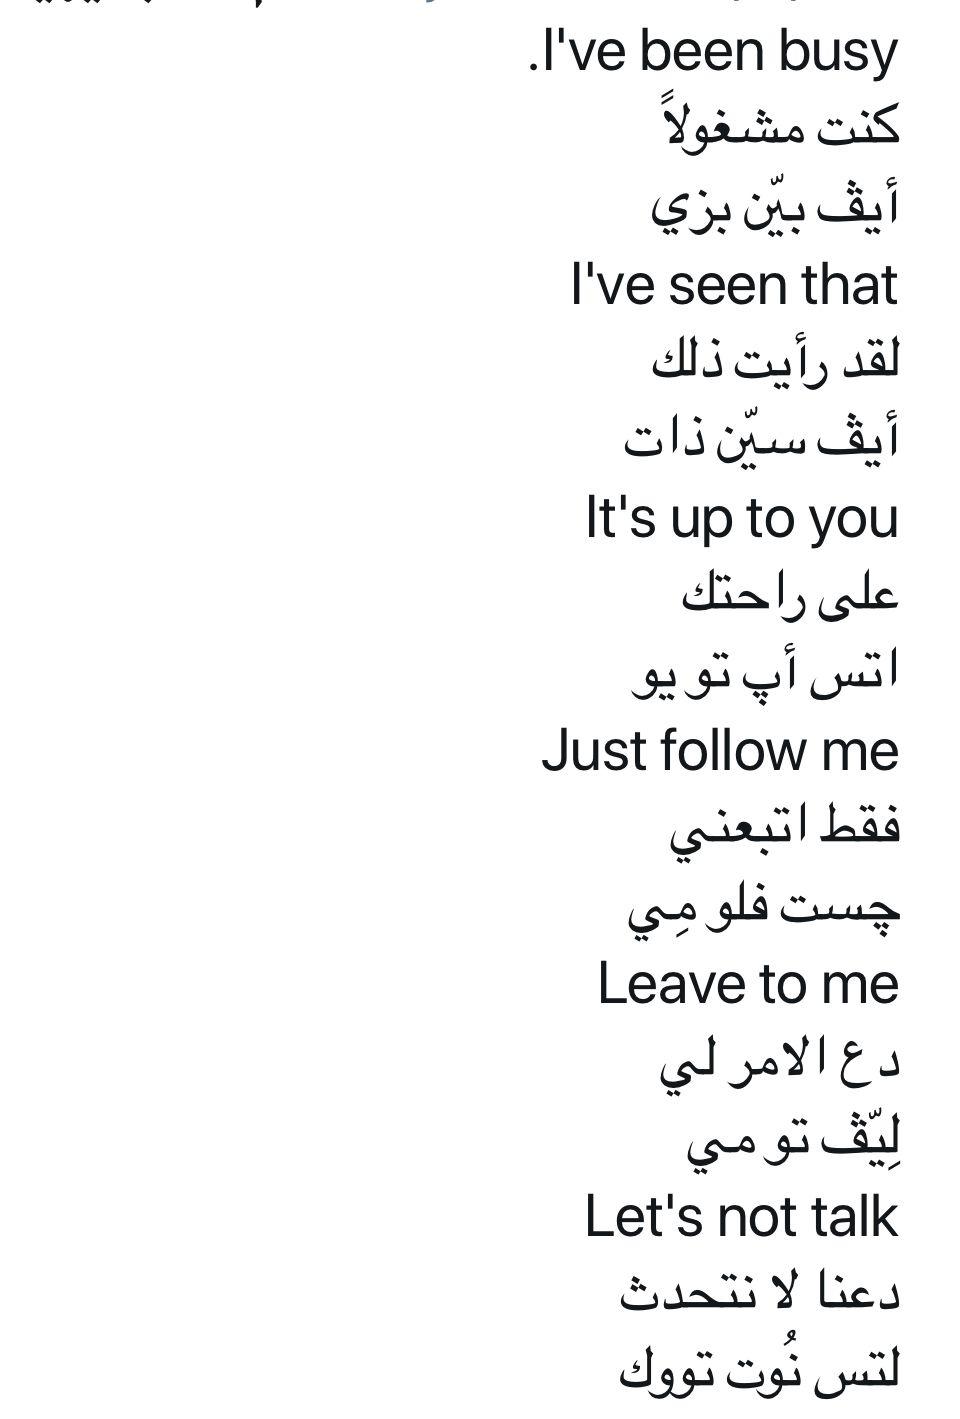 Learning Arabic Msa Fabiennem English Language Learning Grammar English Language Learning English Words